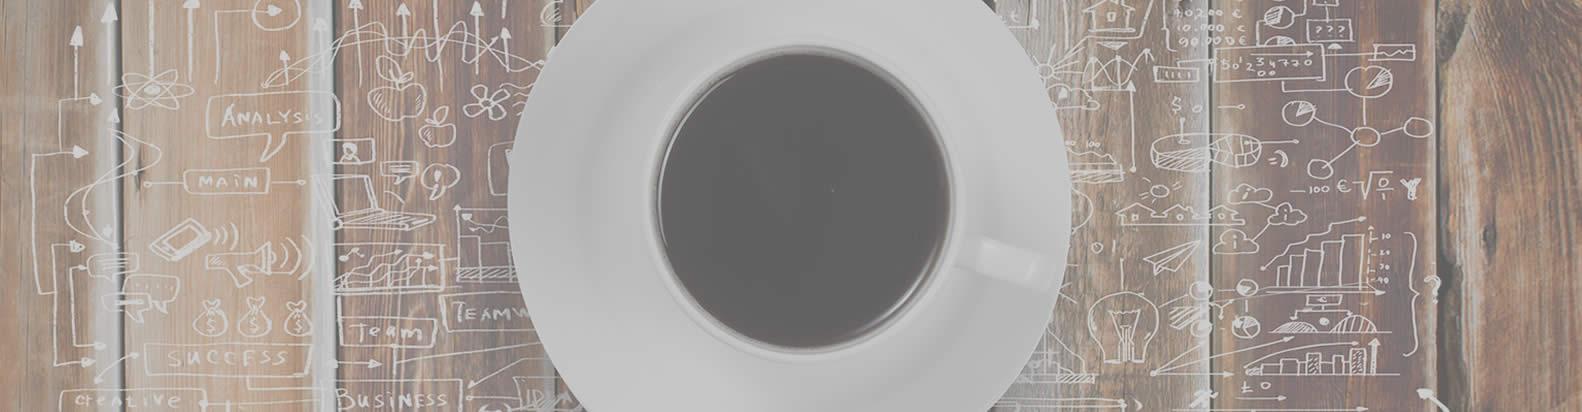 Coffee Brains DBi